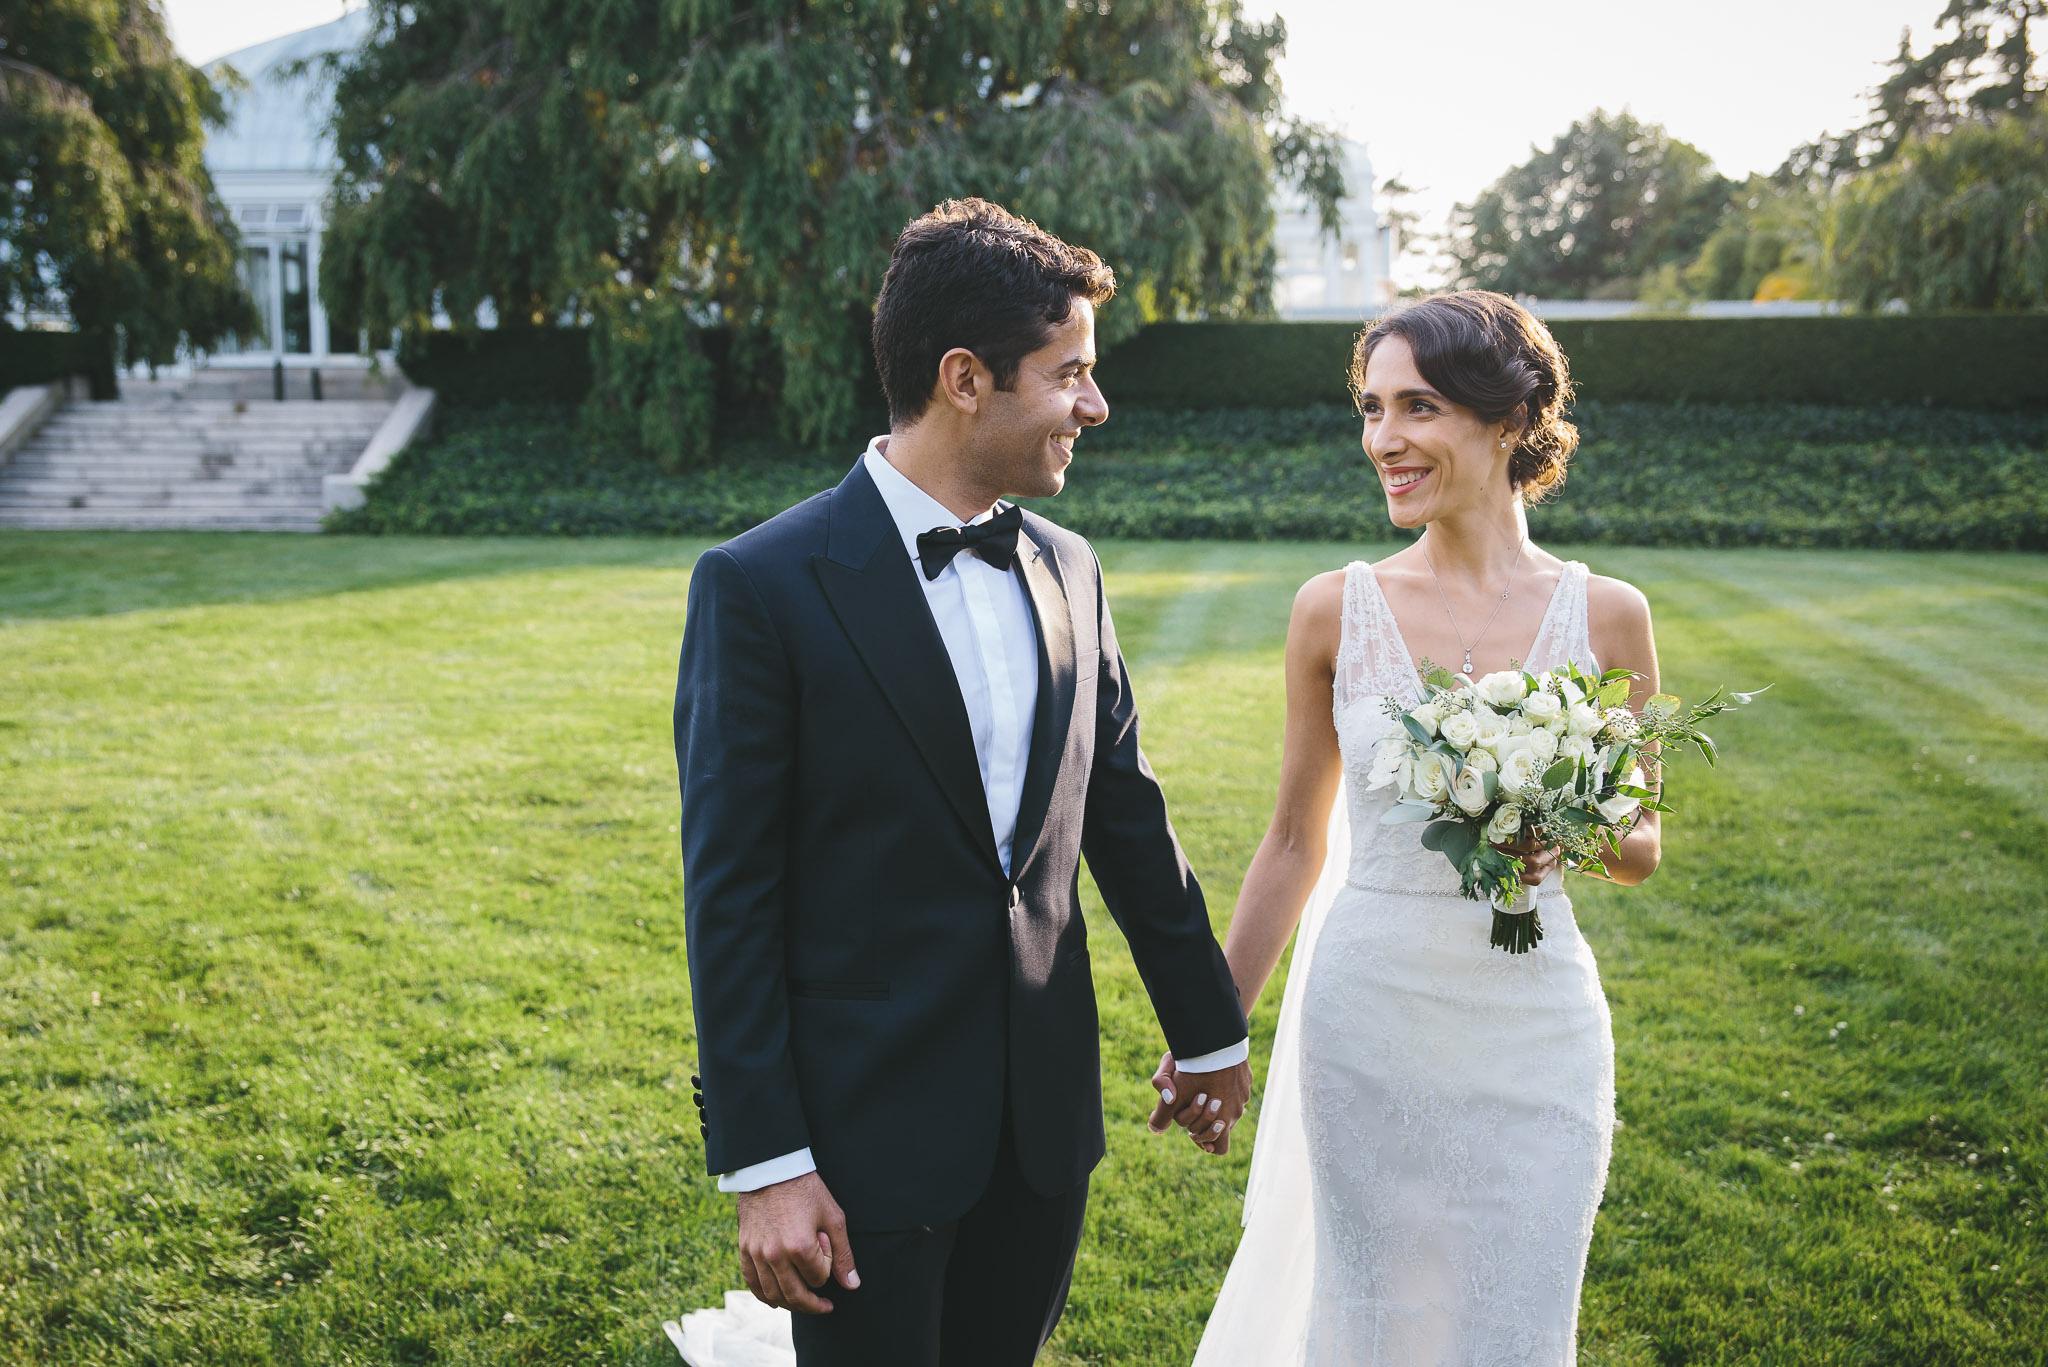 bronx botanical garden wedding sezin eythan - Botanical Garden Wedding